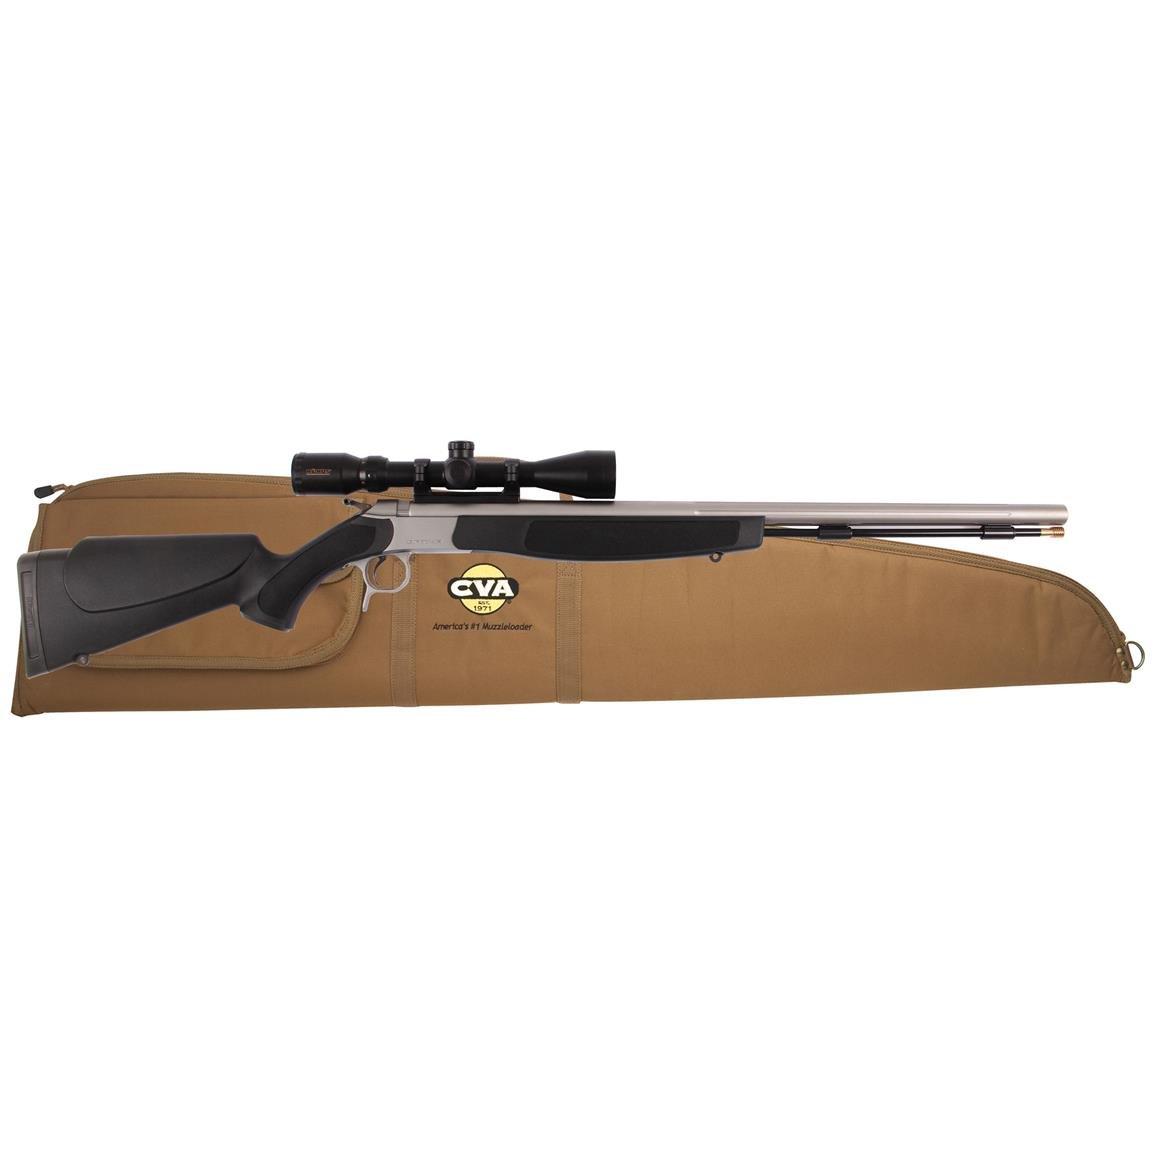 CVA Optima V2  50 Cal  Muzzleloader with KonusPro 3-9x40mm Scope - $305 99  + $4 99 S/H